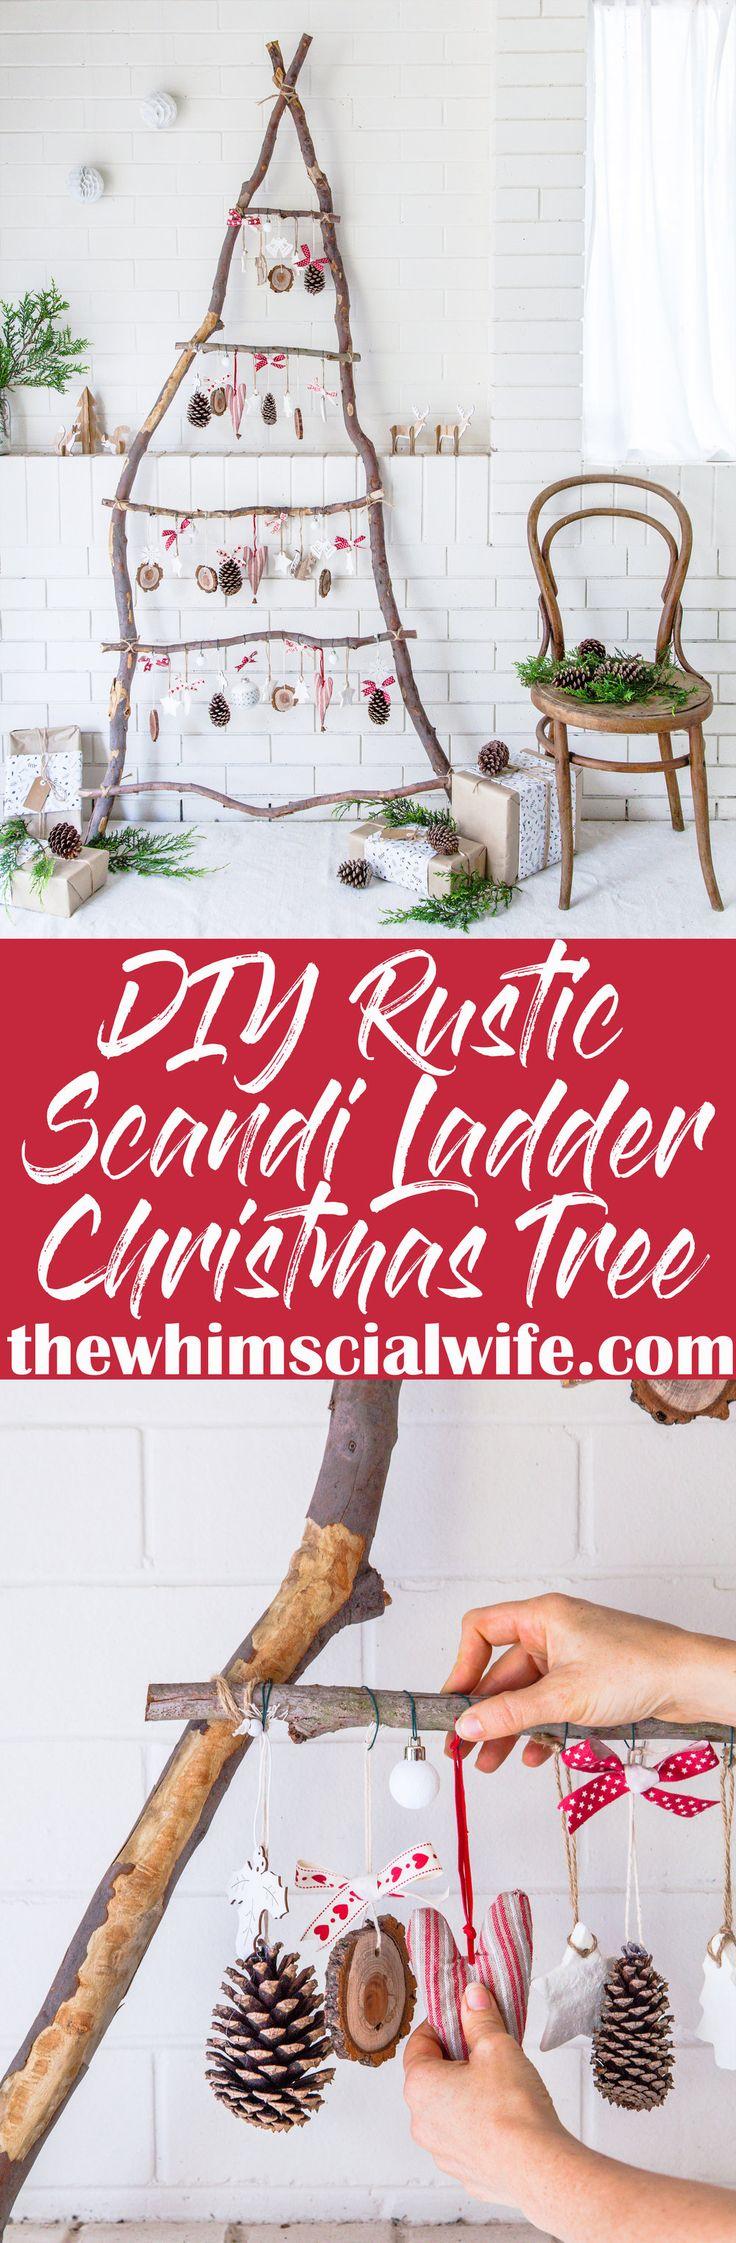 Rustic Scandinavian Ladder Christmas Tree